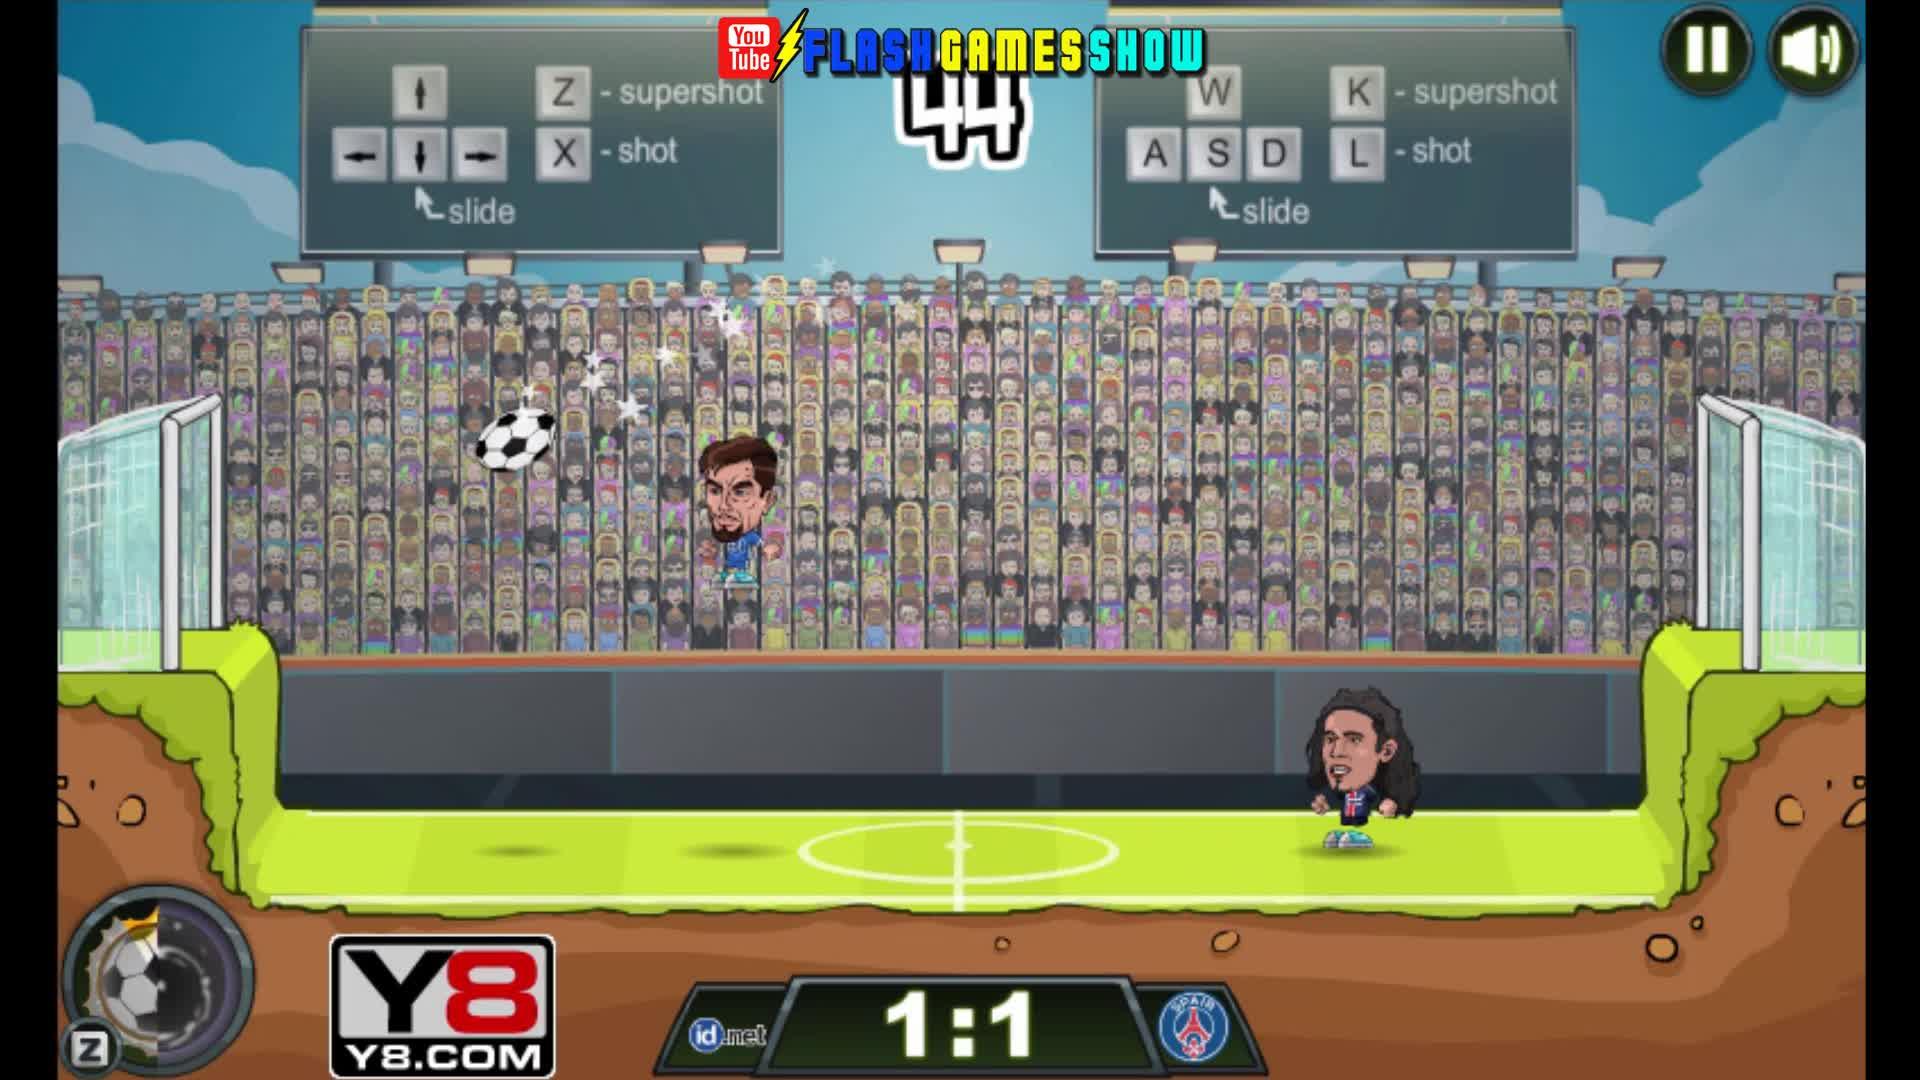 Football Legends 2016 Walkthrough Video Watch at Y8